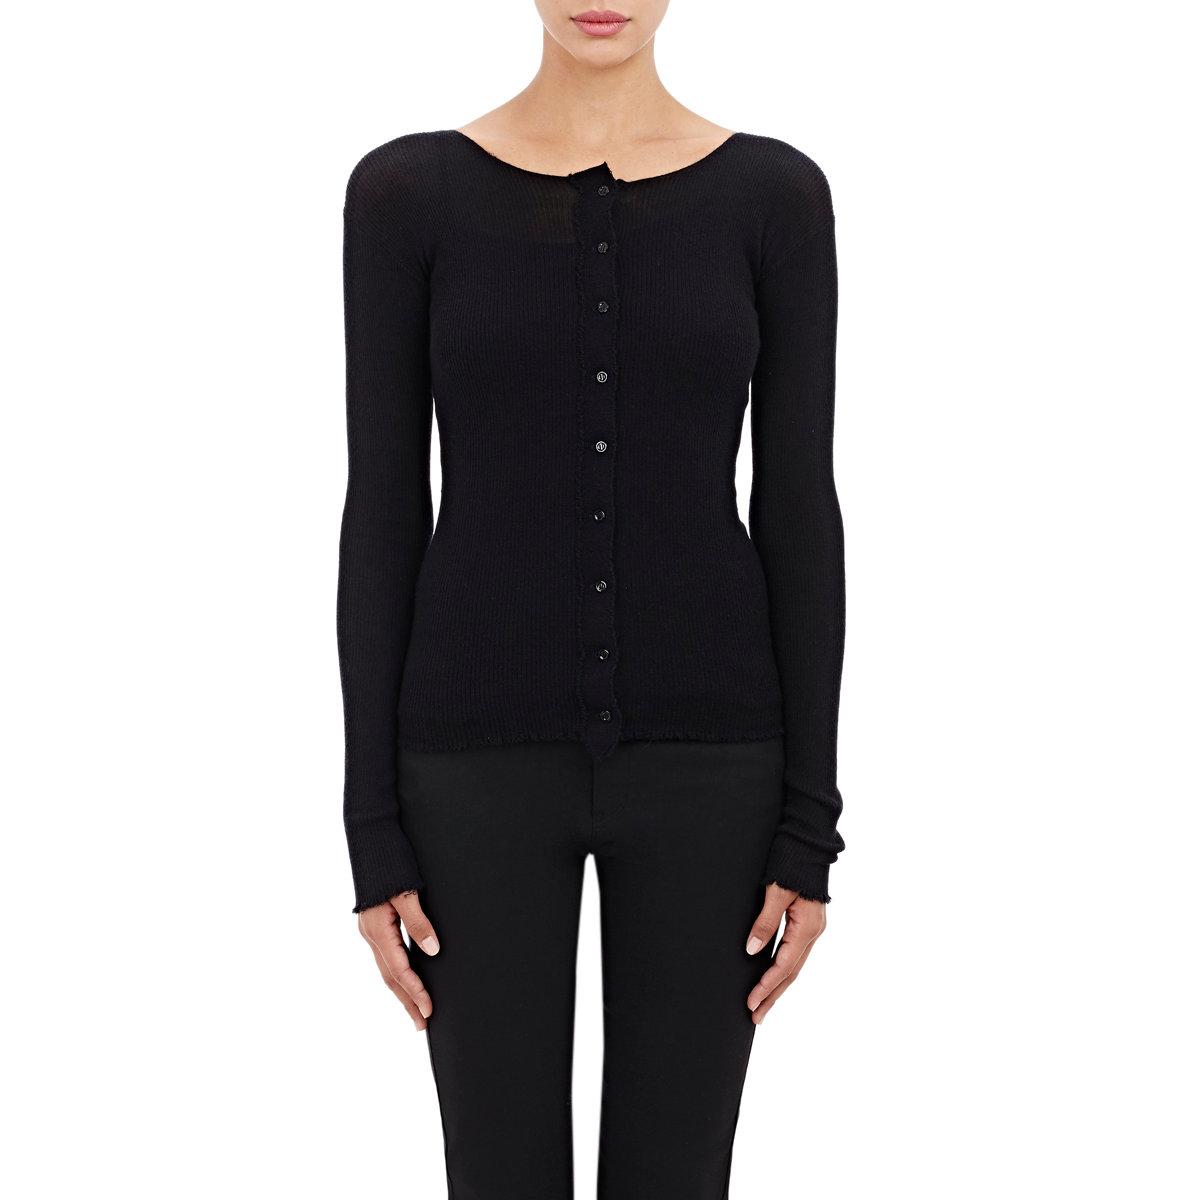 Helmut lang Women's Fine-gauge Cashmere Cardigan in Black | Lyst